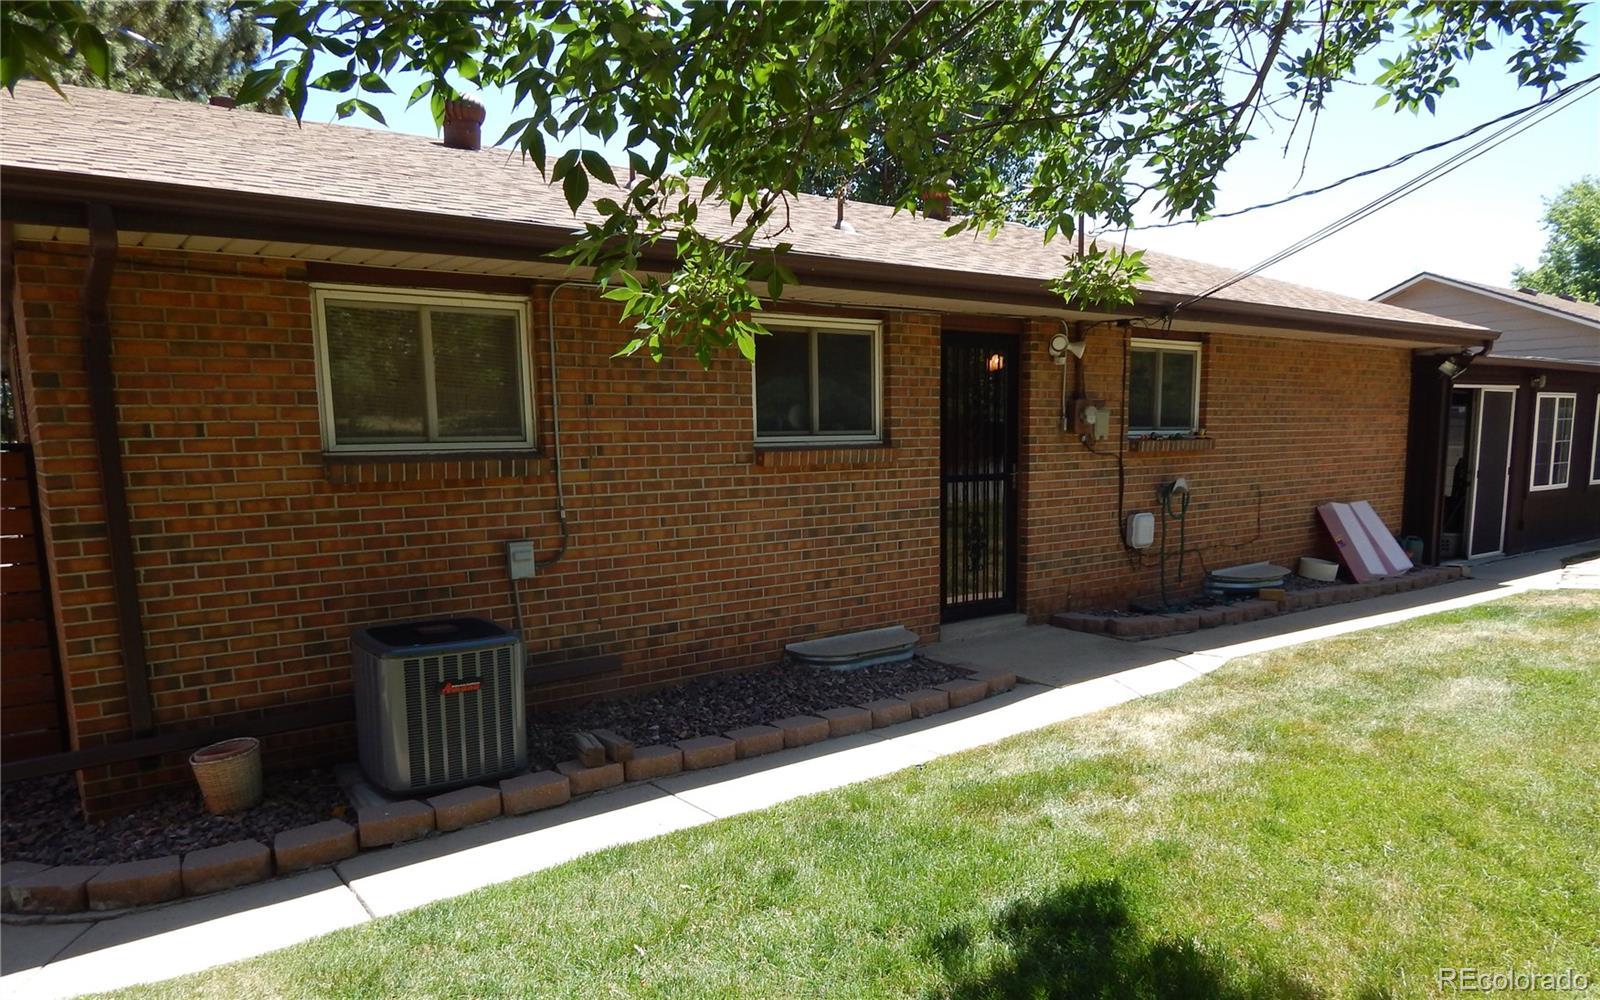 MLS# 8273867 - 3 - 2985 N Xenon Street, Wheat Ridge, CO 80215